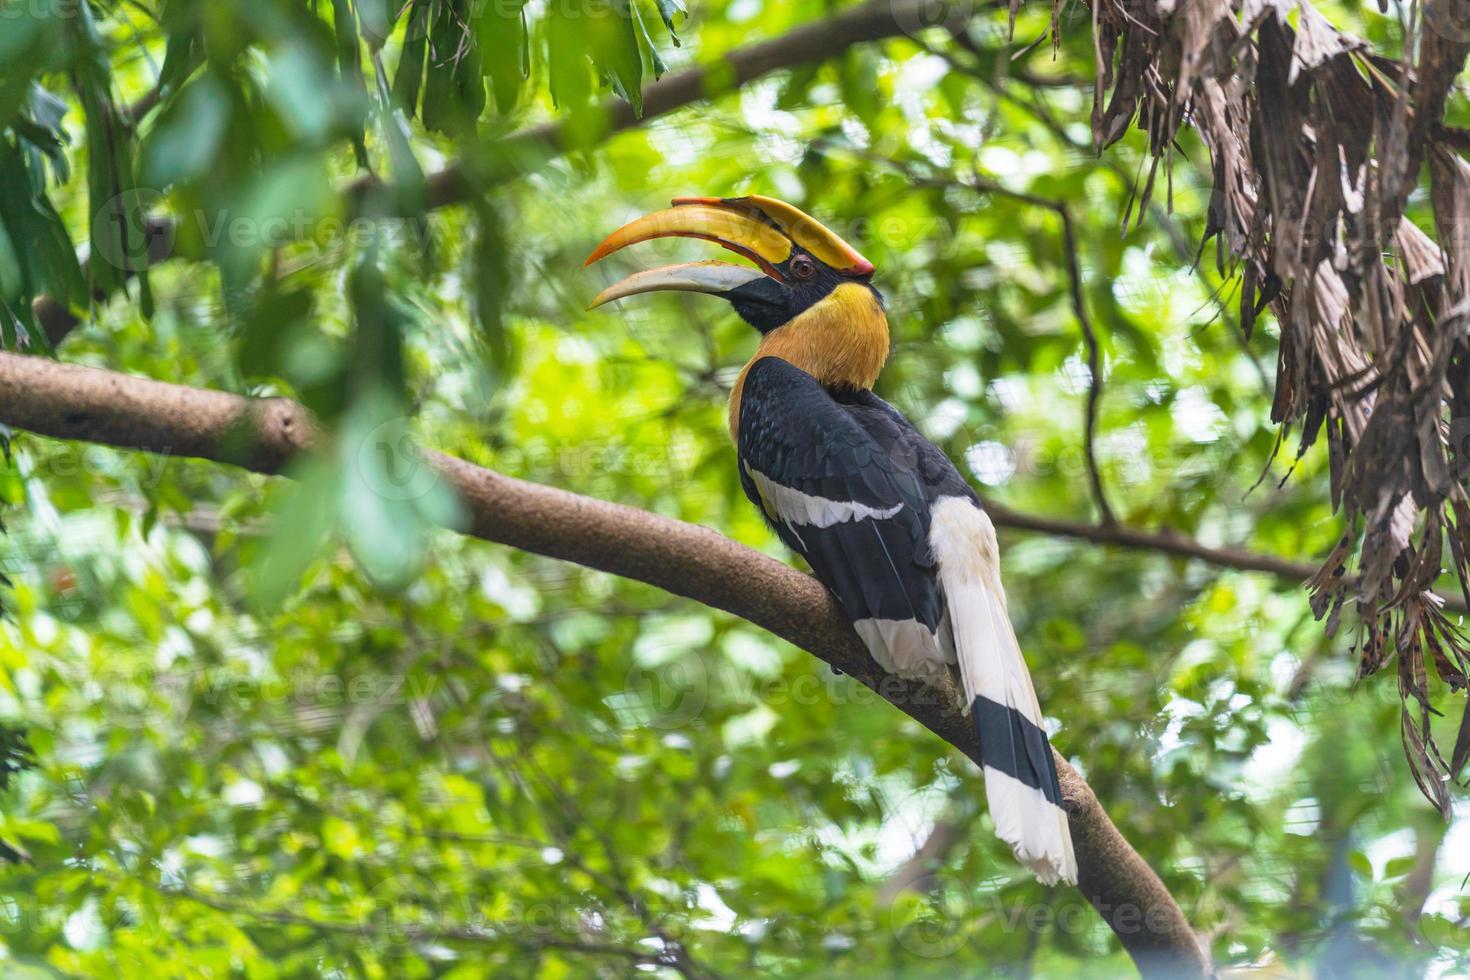 Hornbill bird perched in tree photo